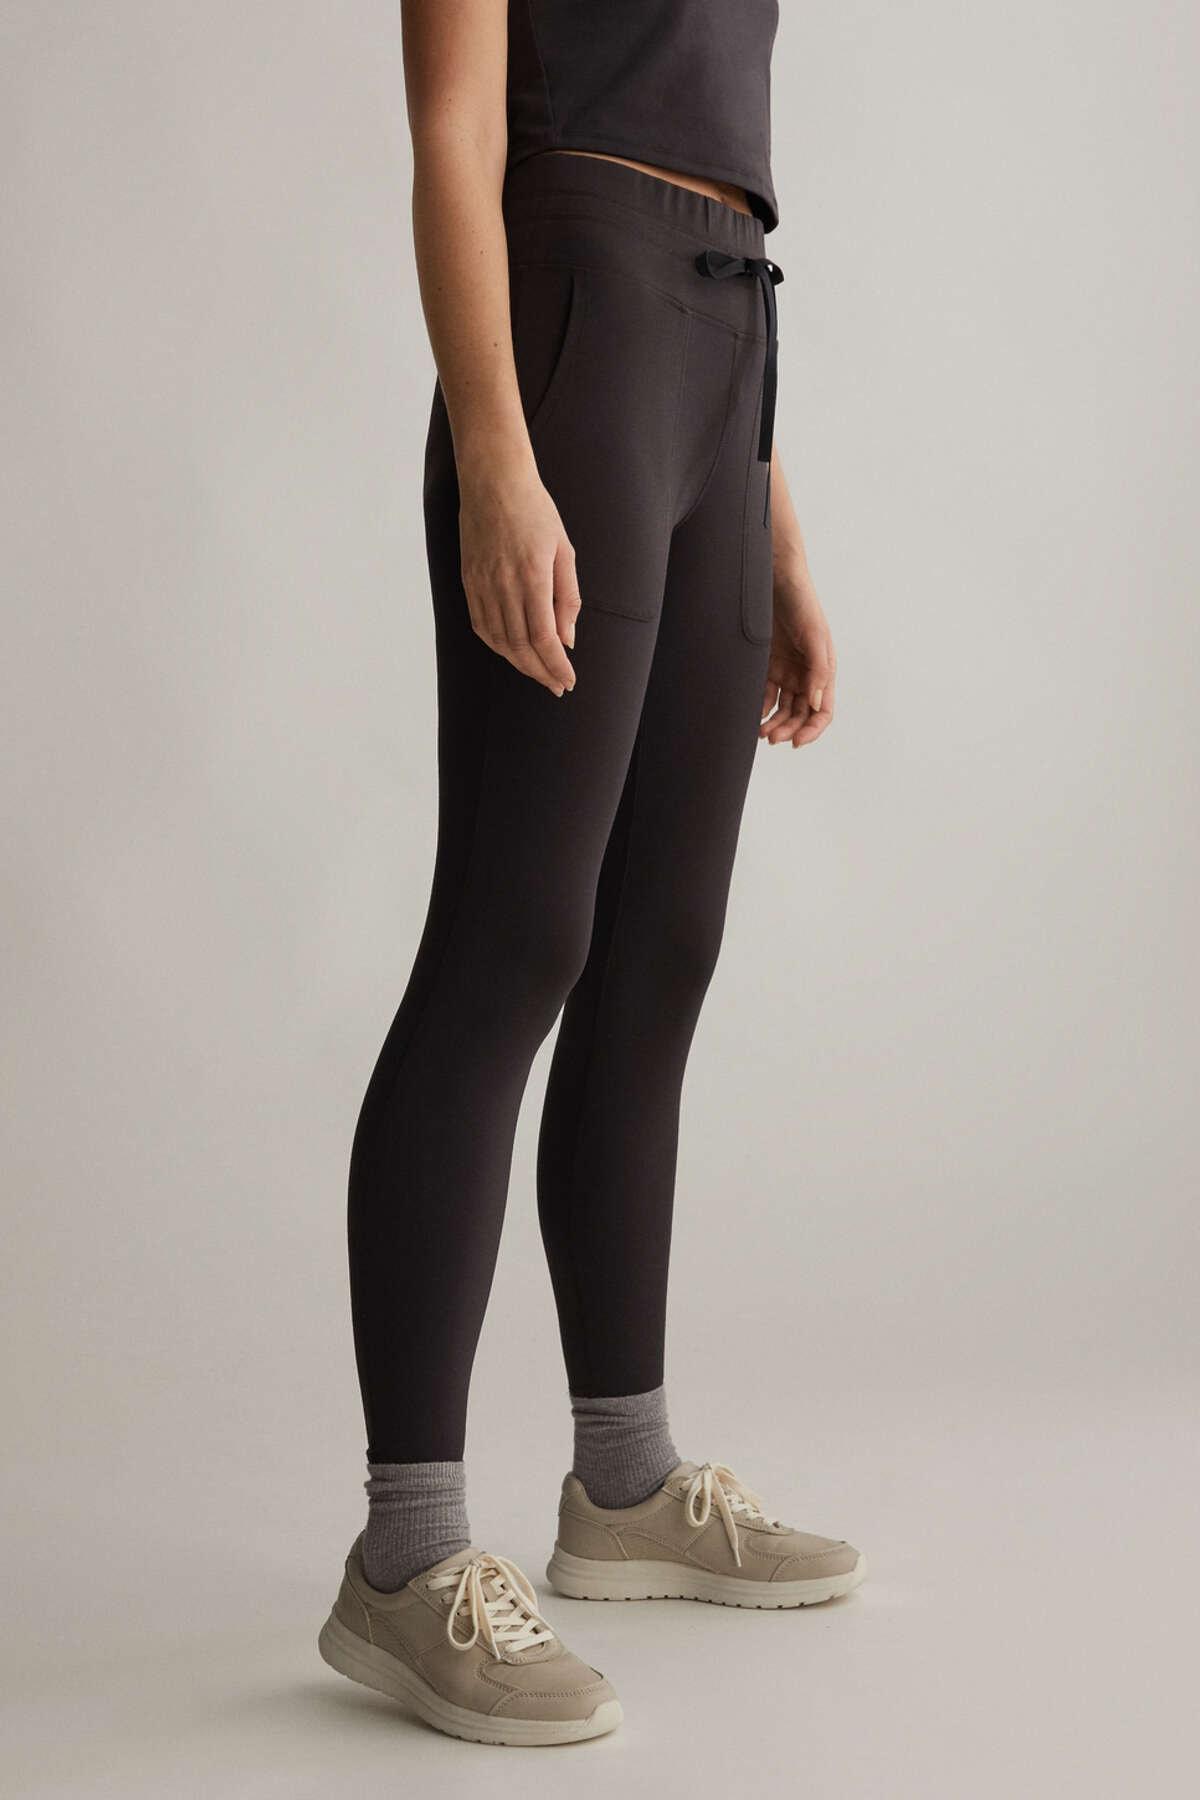 Oysho Kadın Bağcıklı Comfort Tayt Siyah 31802222